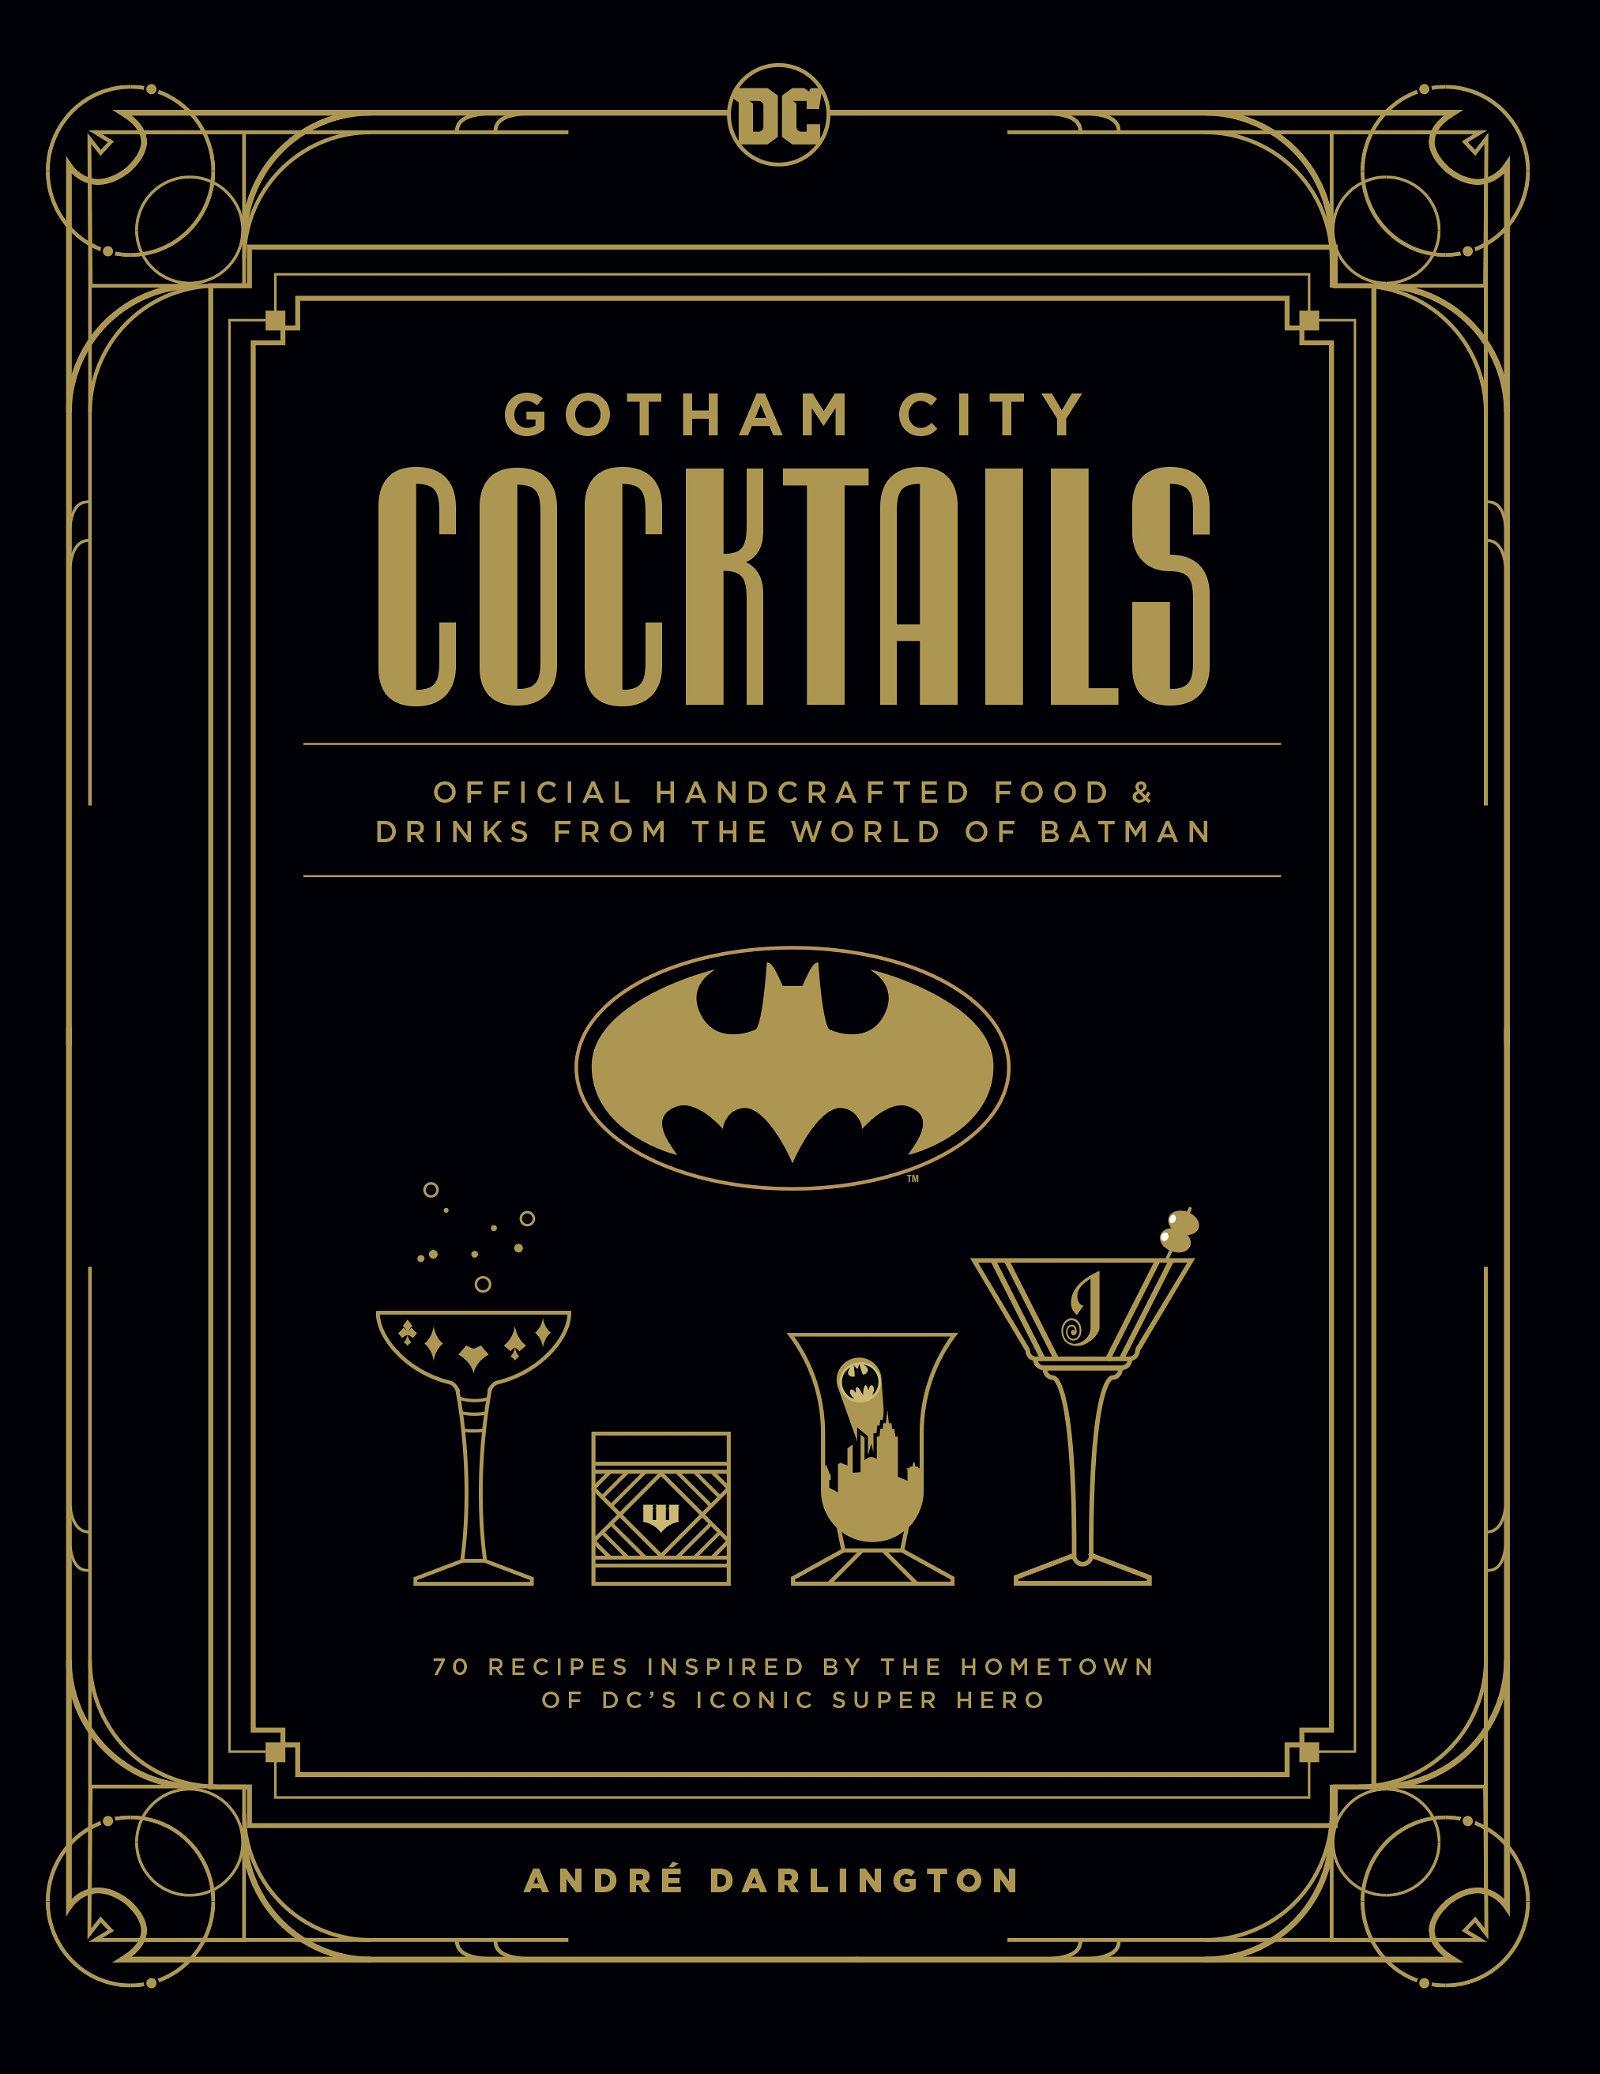 Gotham City Cocktails, Coverart